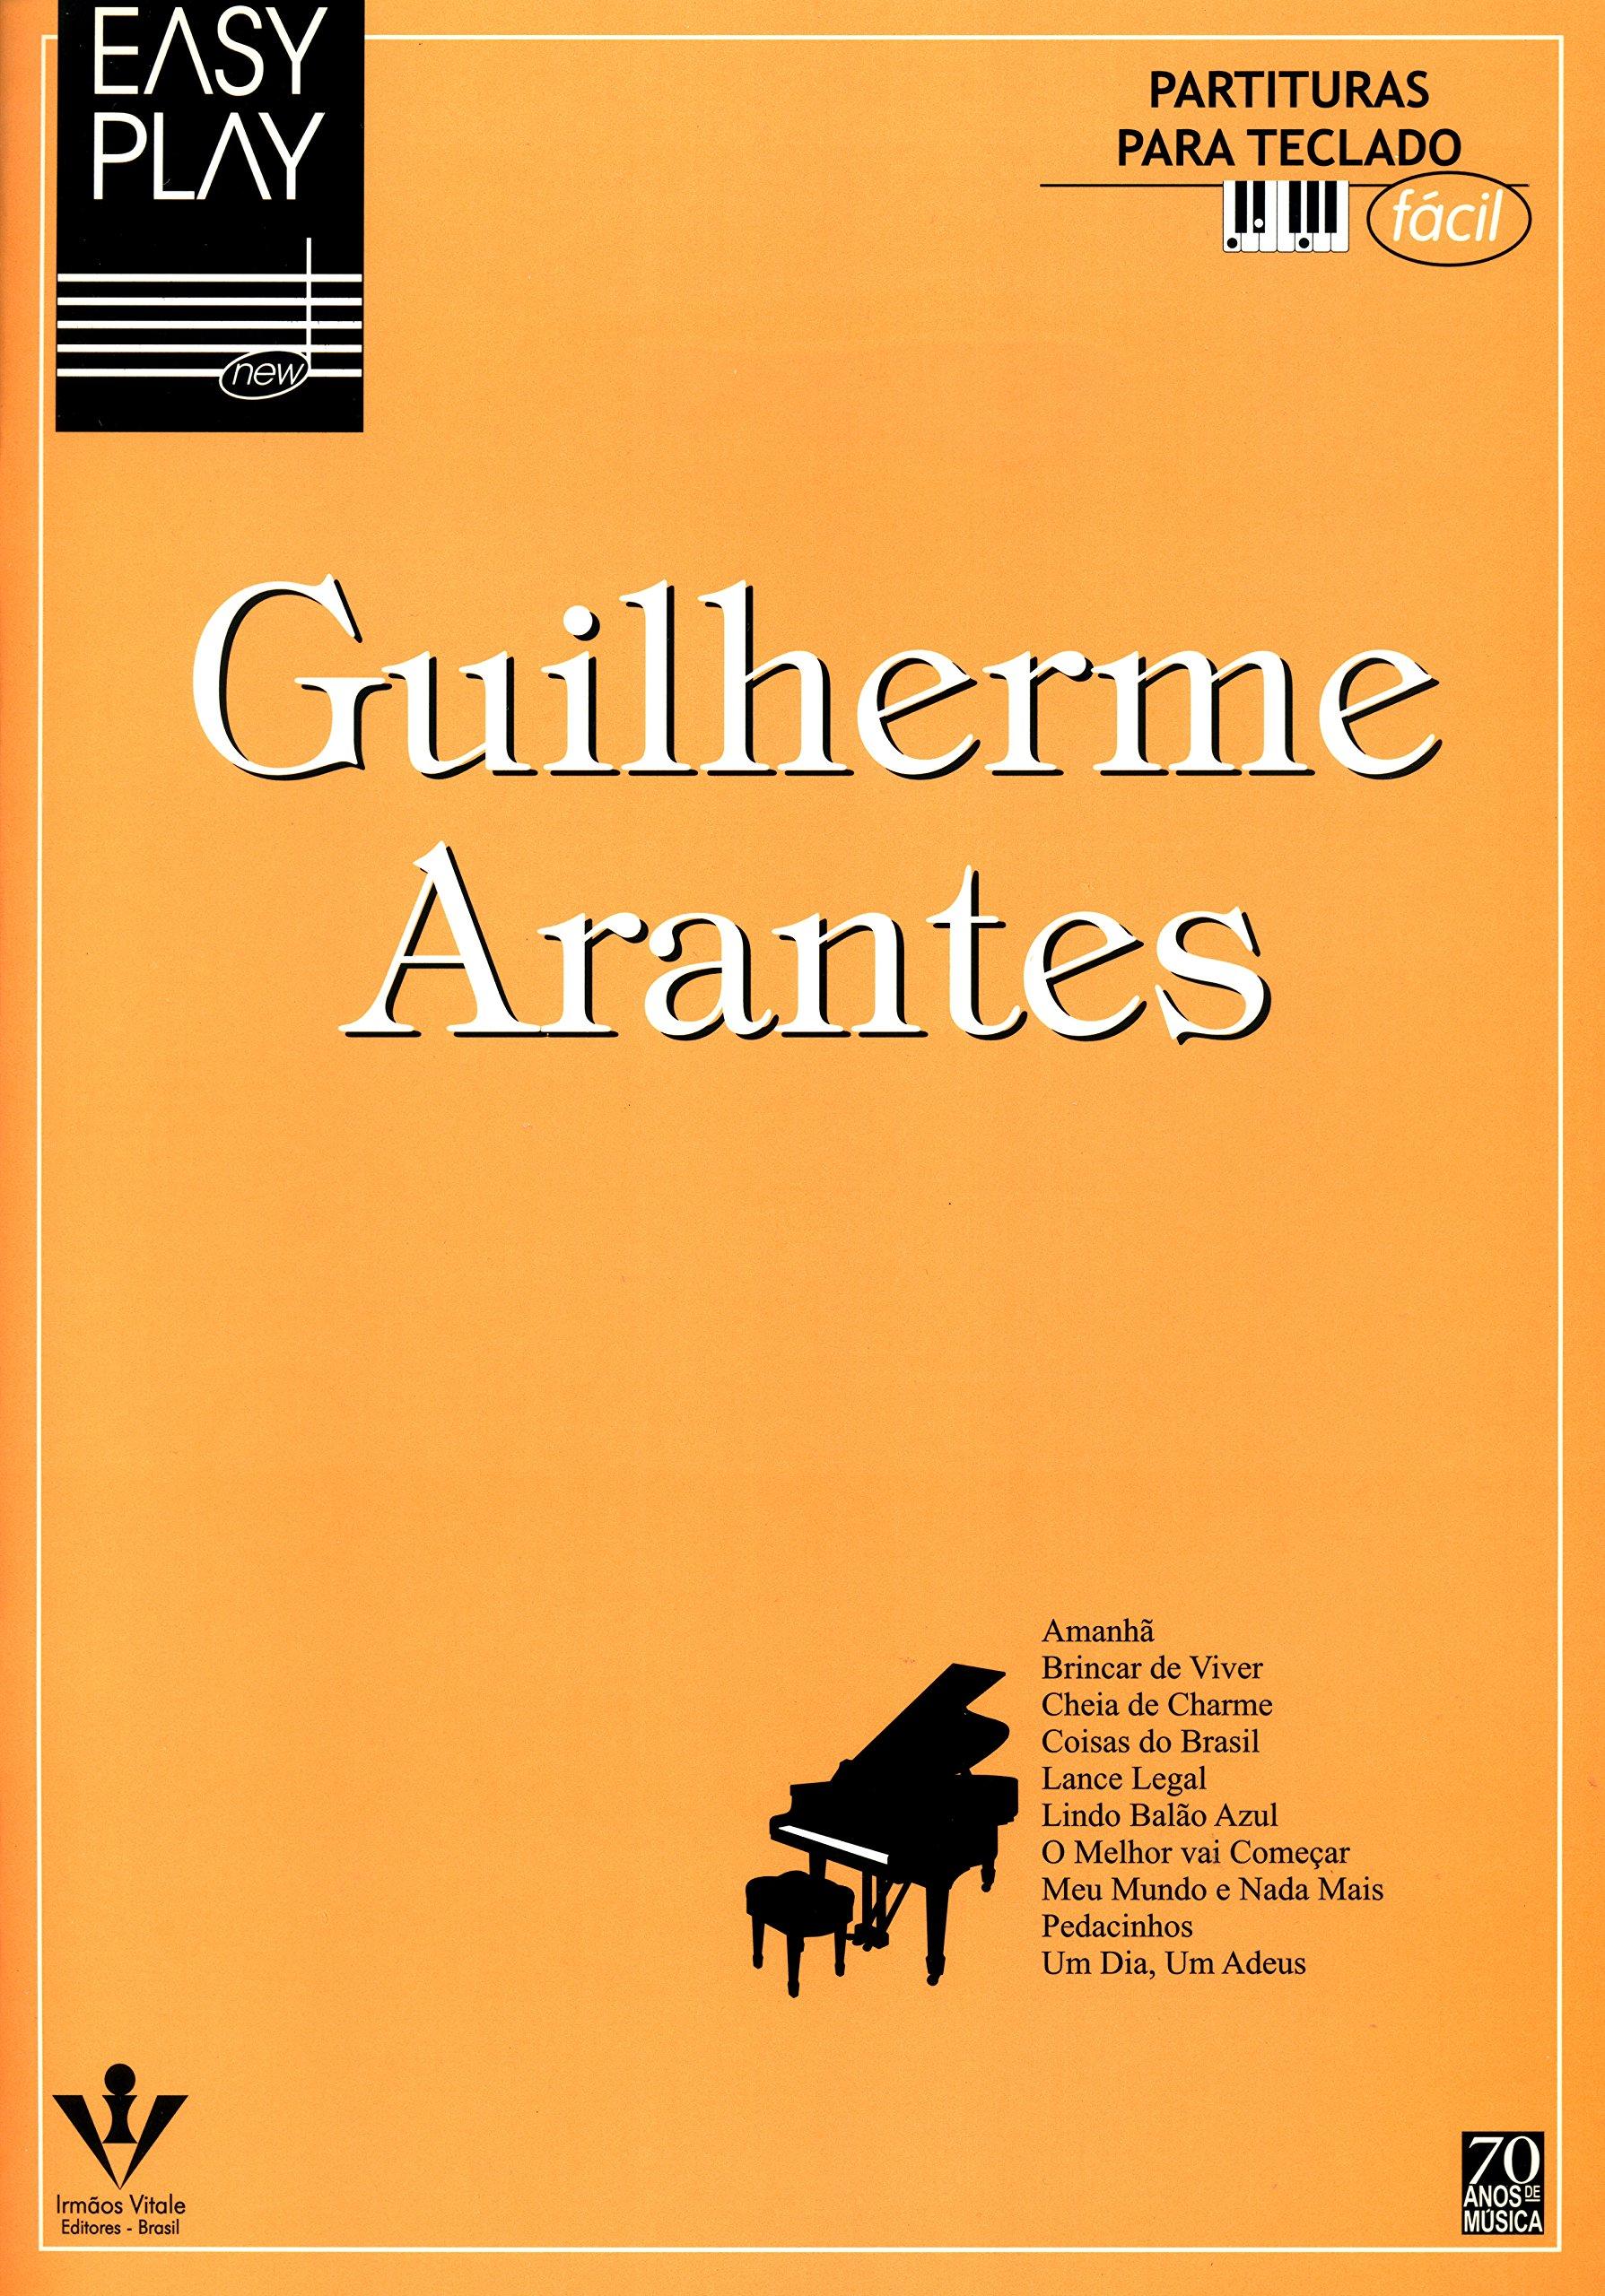 Easy Play. Guilherme Arantes (Portuguese Brazilian) Paperback – 1996